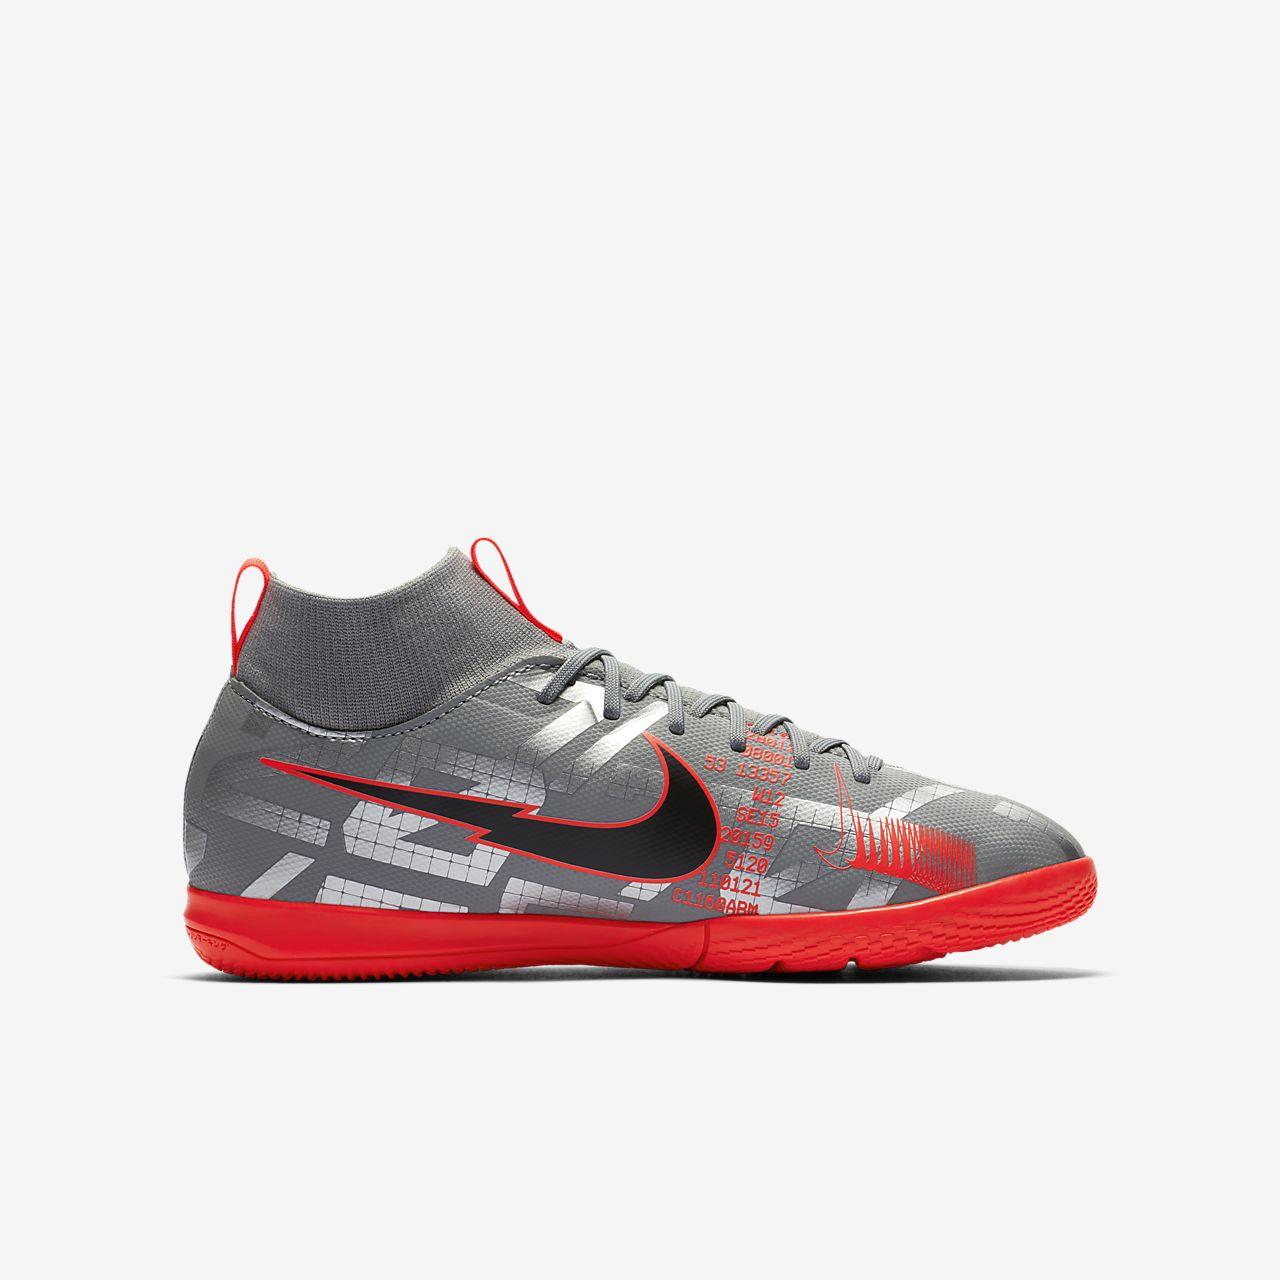 Scarpa da calcio per campi indoor Nike Jr. Mercurial